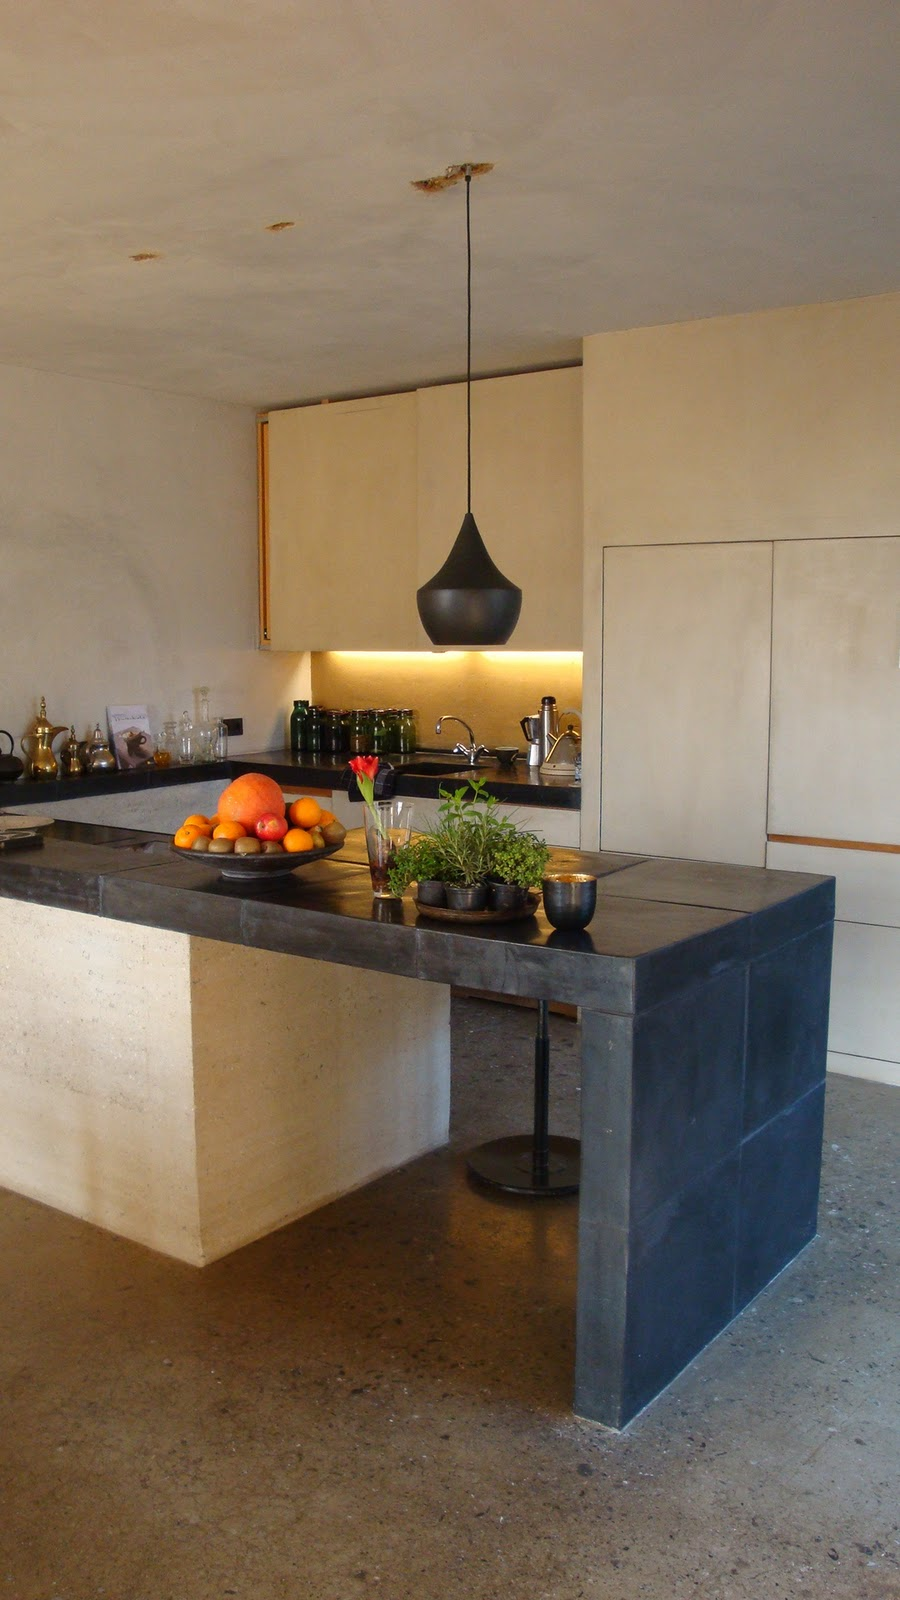 Miaw inredning & design: lerhus